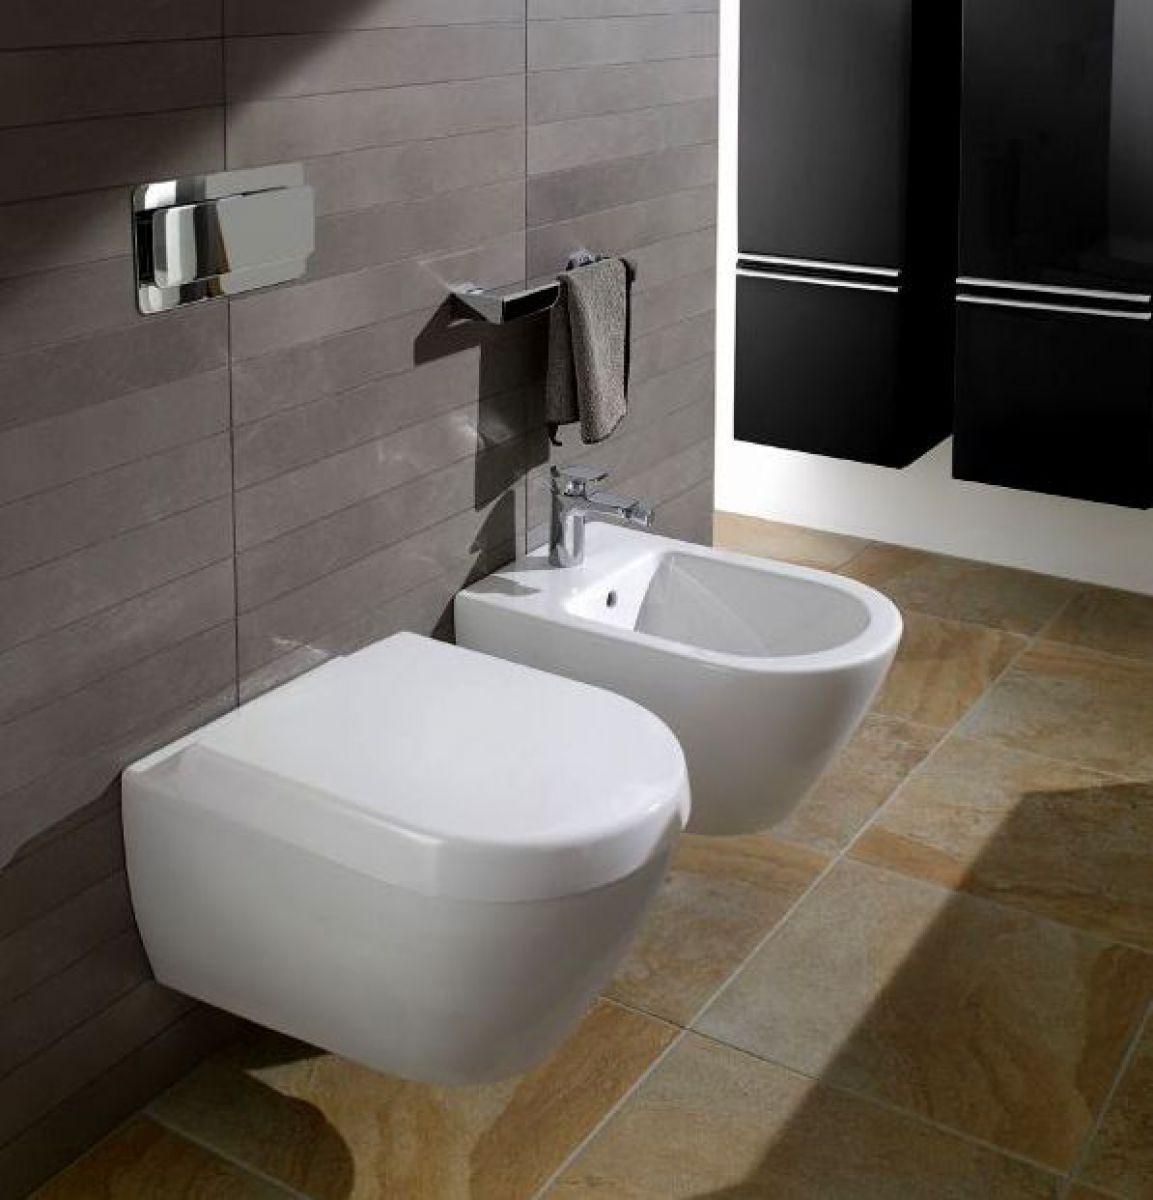 Villeroy And Boch Soho Wall Hung Wc Wall Mounted Toilet Wall Hung Toilet Bathroom Design Small